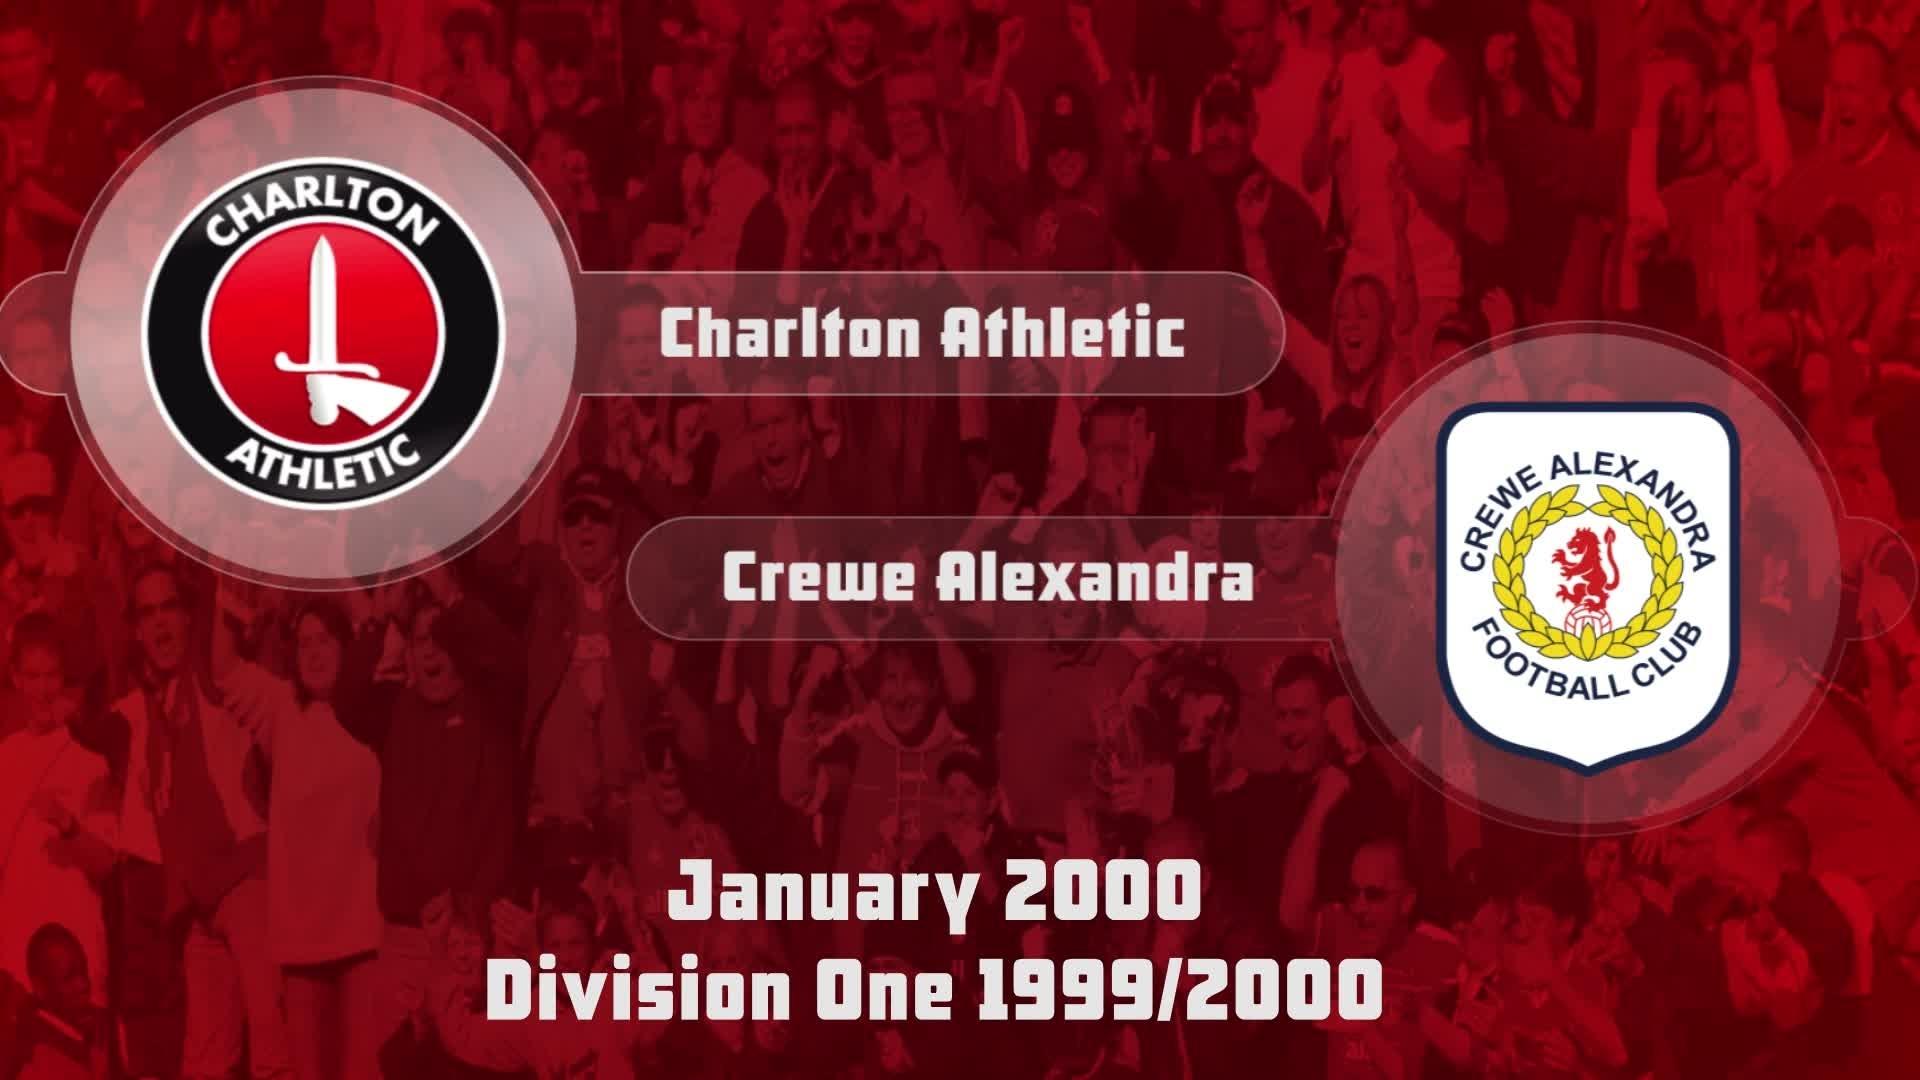 31 HIGHLIGHTS | Charlton 1 Crewe 0 (Jan 2000)